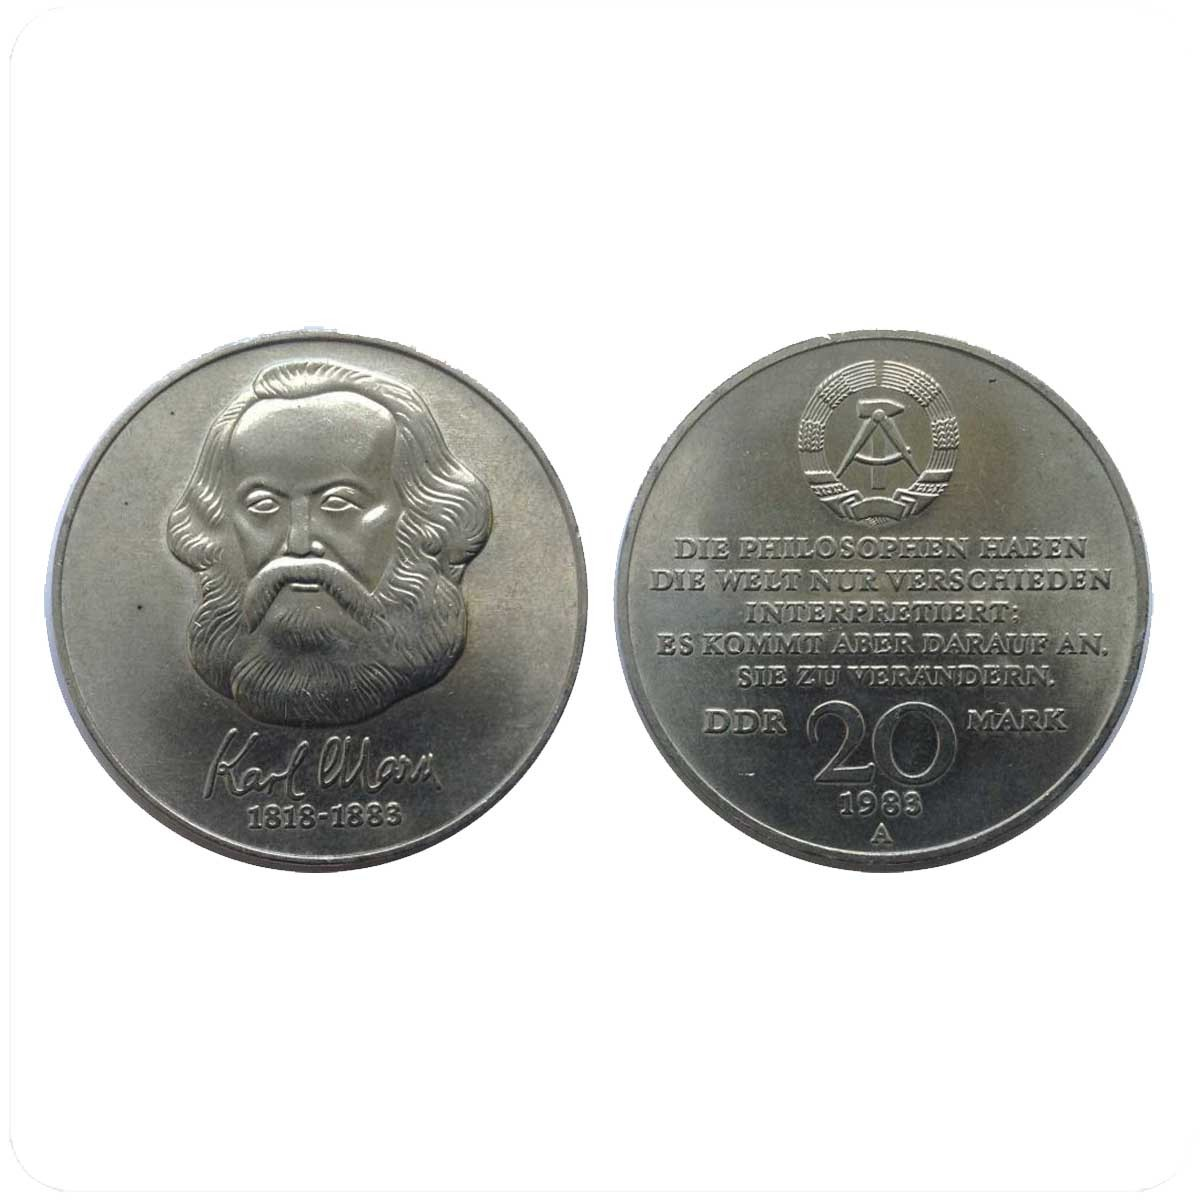 ГДР 20 марок 1983 года 100 лет со смерти Карла Маркса